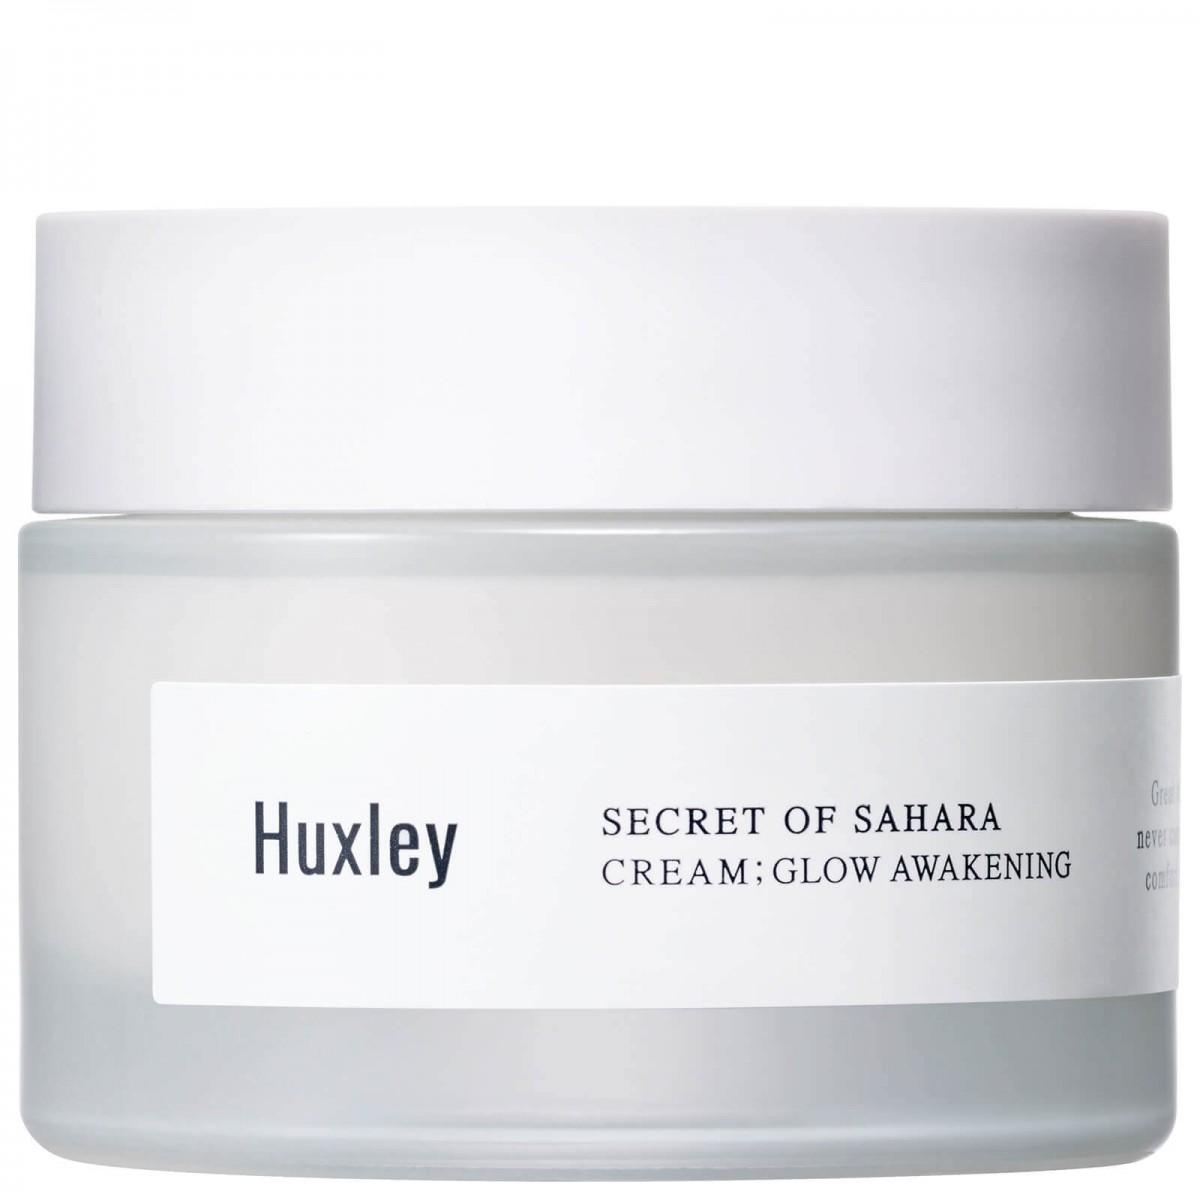 Secret of Sahara Glow Awakening Cream [Huxley]